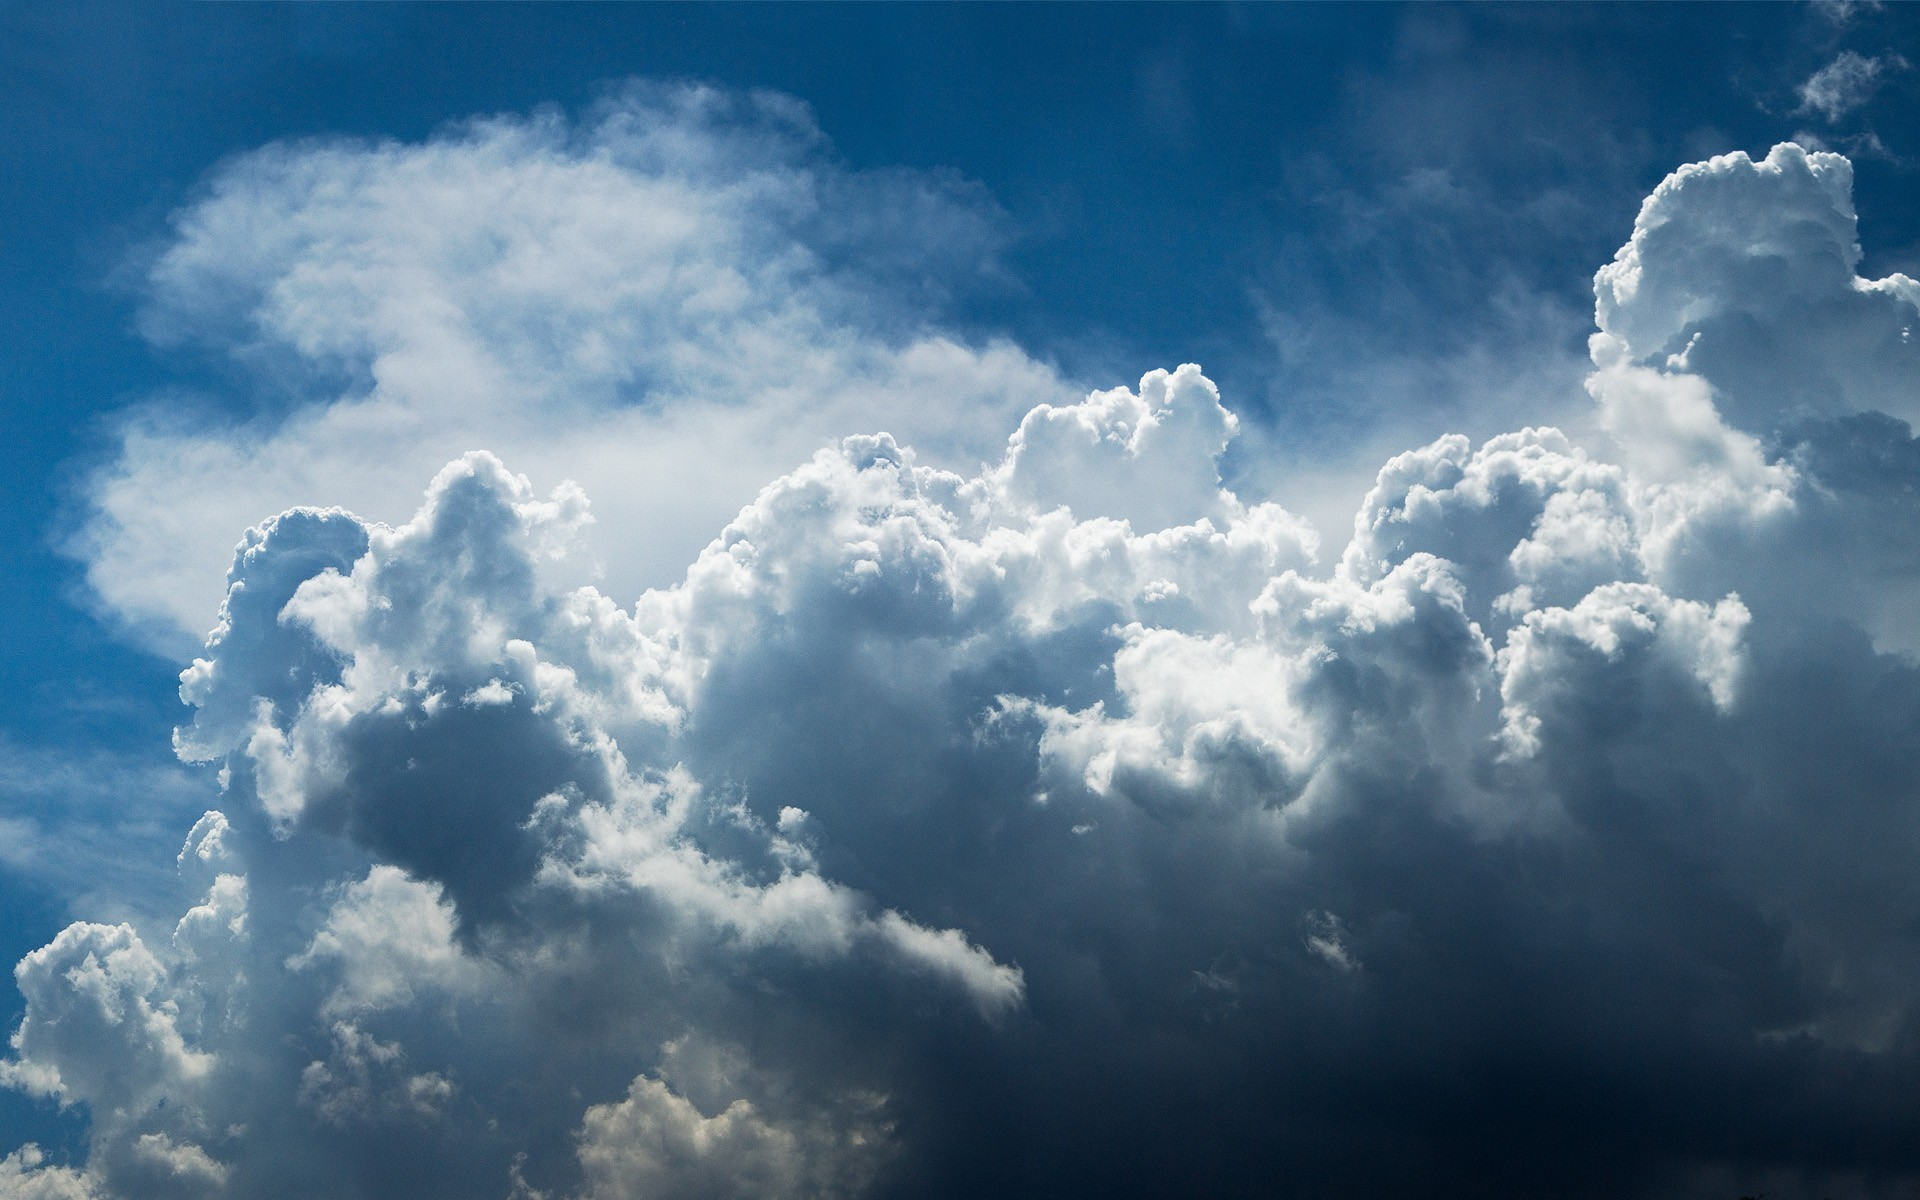 Final Fantasy Cloud Iphone Wallpaper About Cloud Wallpaper